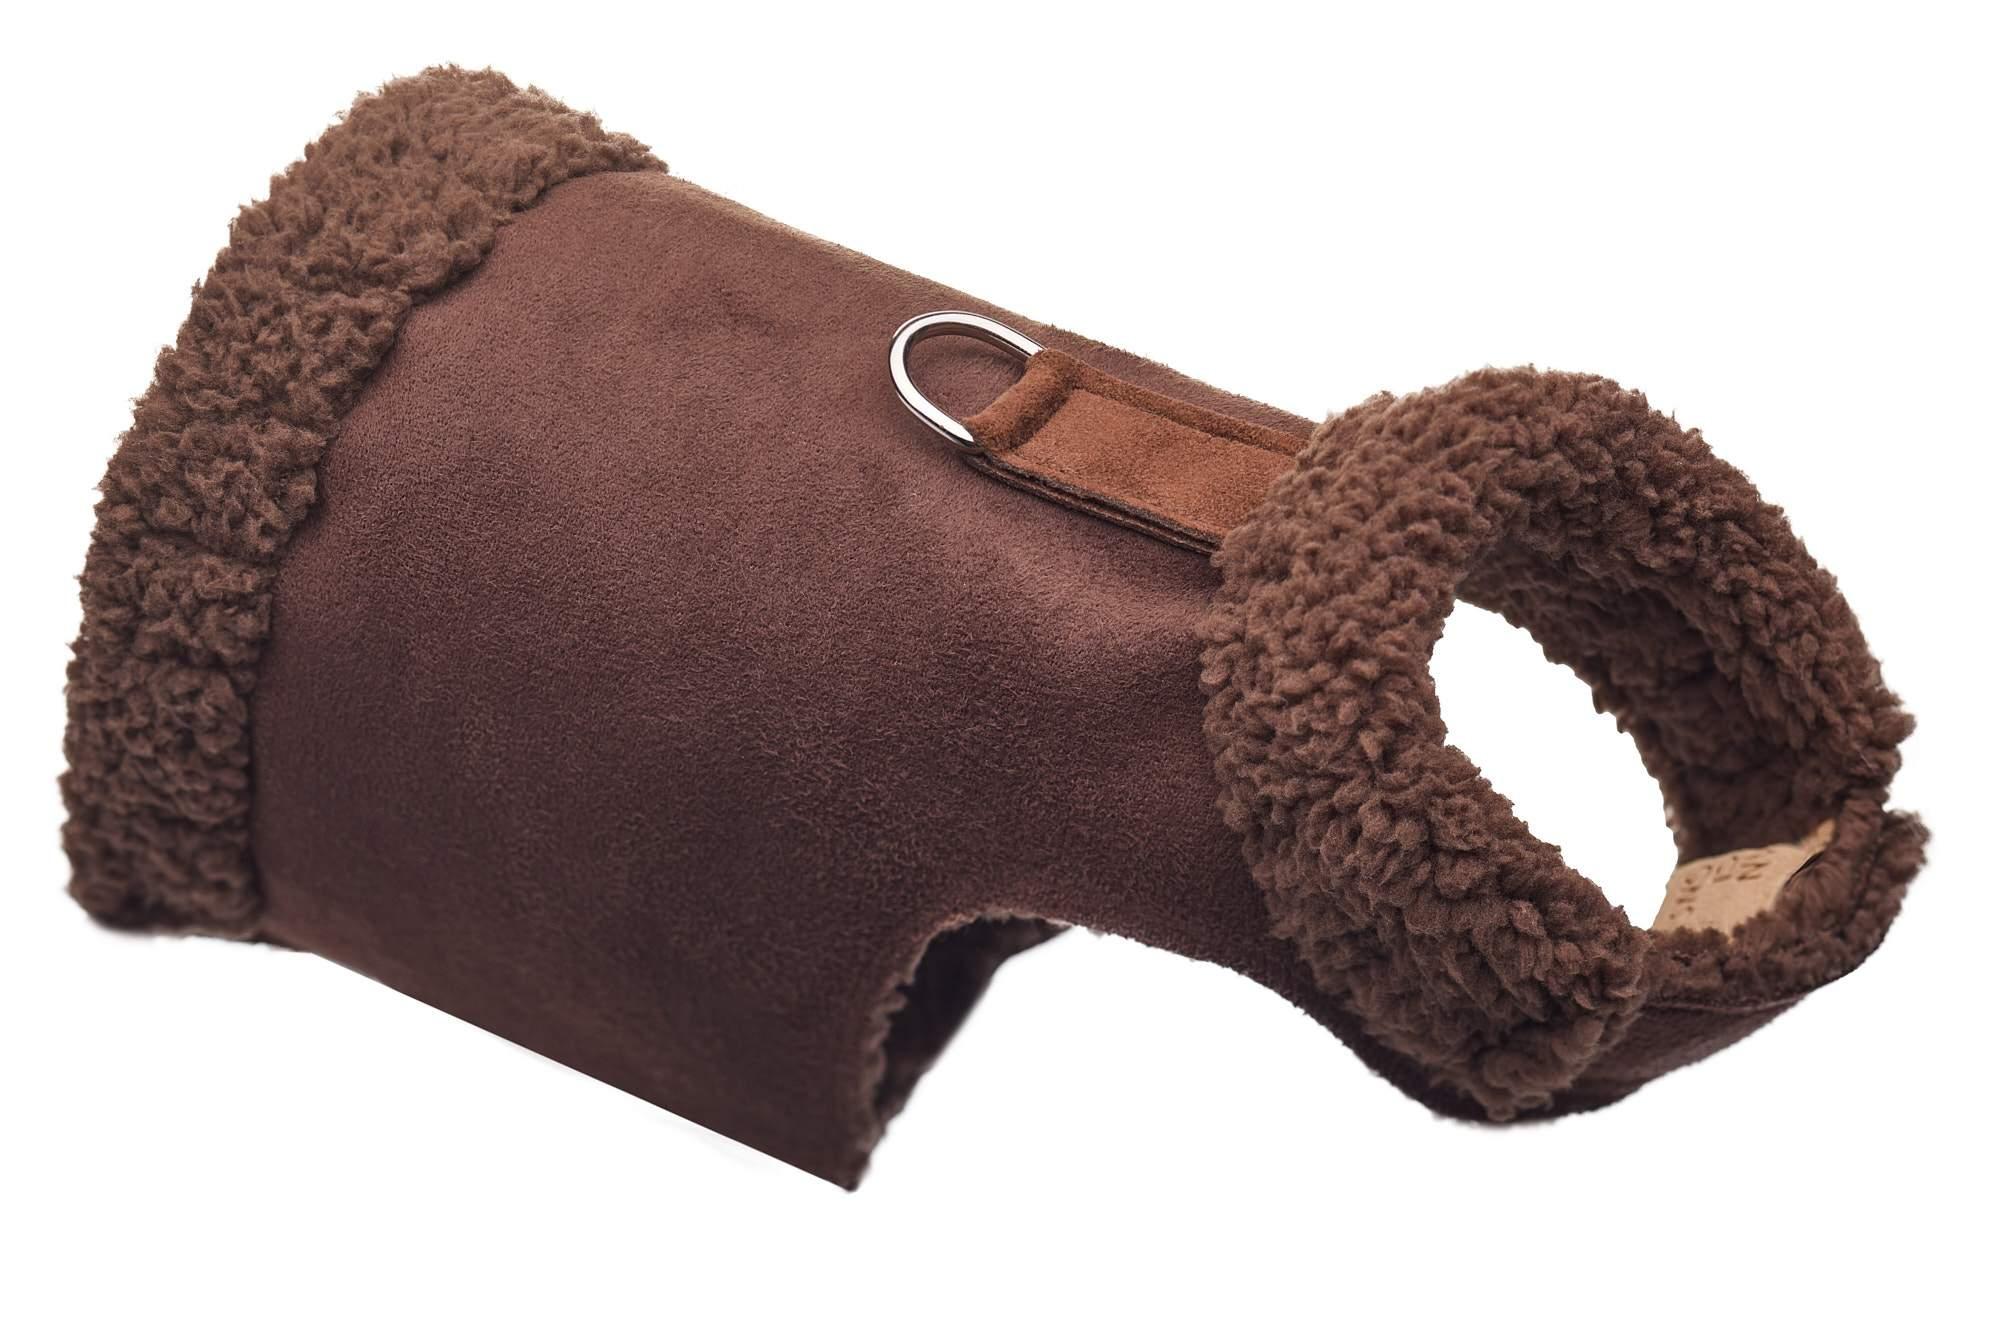 Chocolate Bowzer